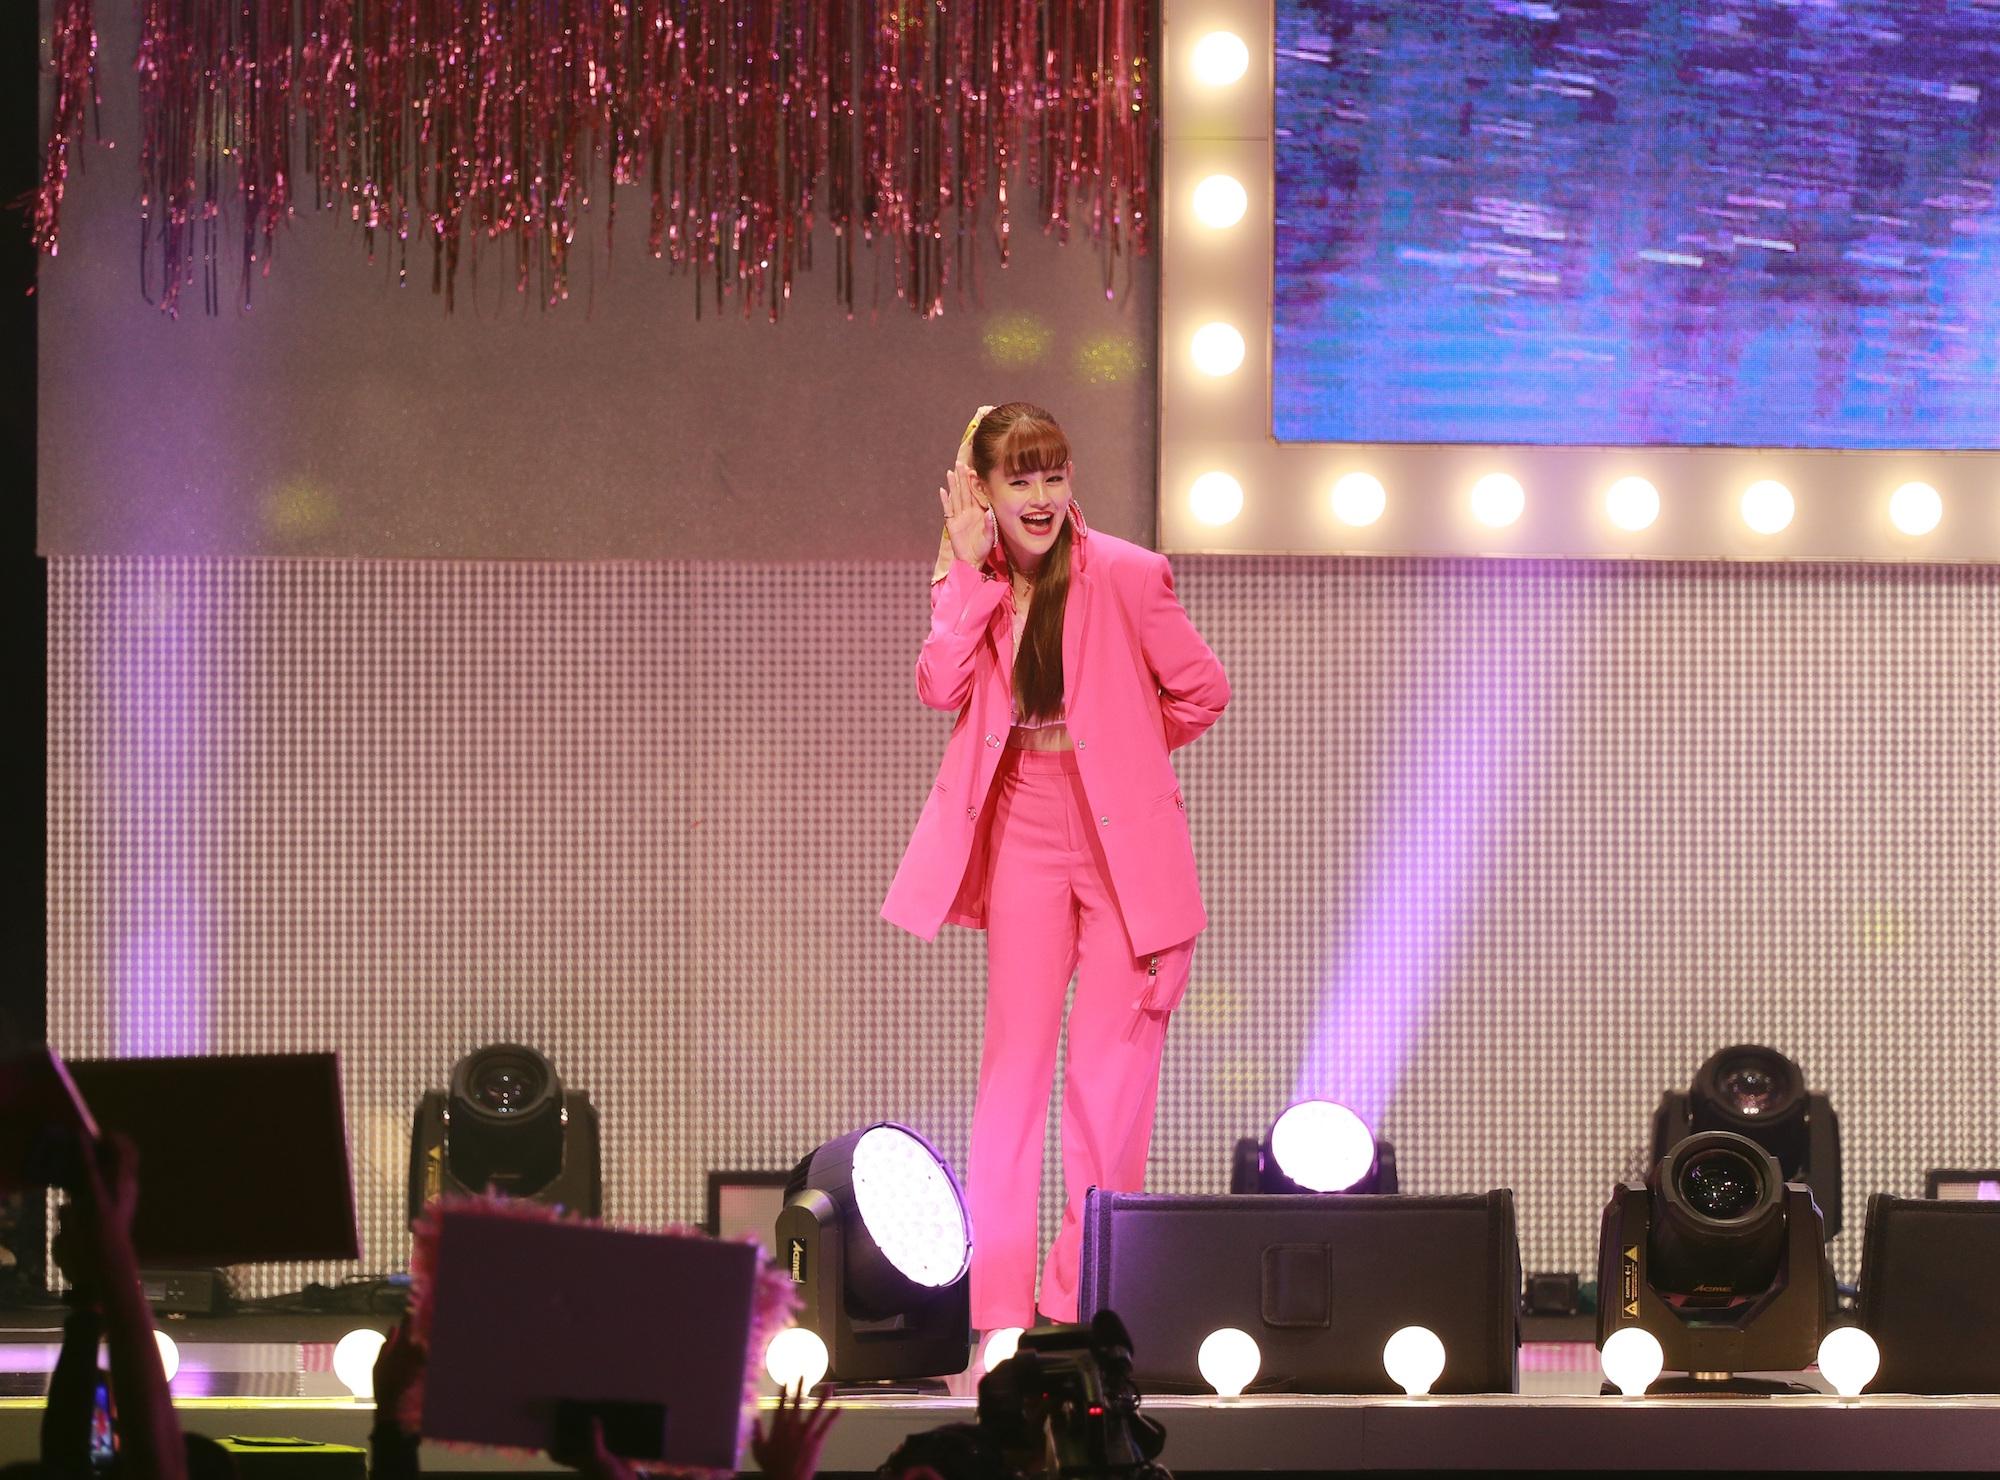 emma(ViViモデル)/ViViNight in Taipei(11月16日(土)、 台湾の新光三越Legacy MAXにて。